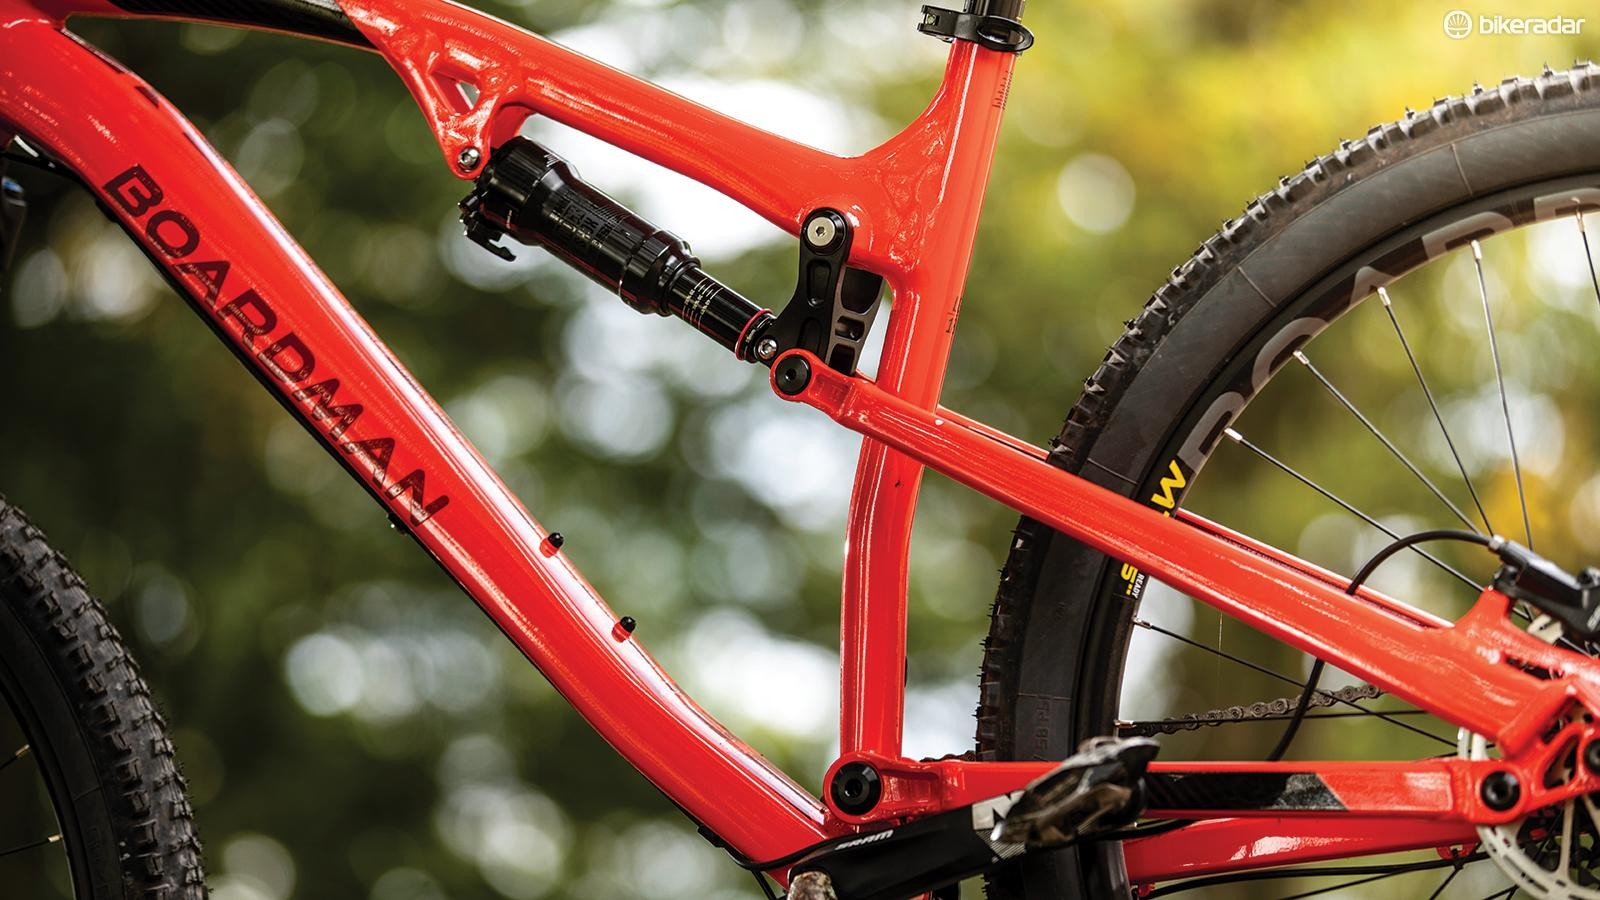 88927dee0f6 Boardman MTR 8.9 first ride review - BikeRadar